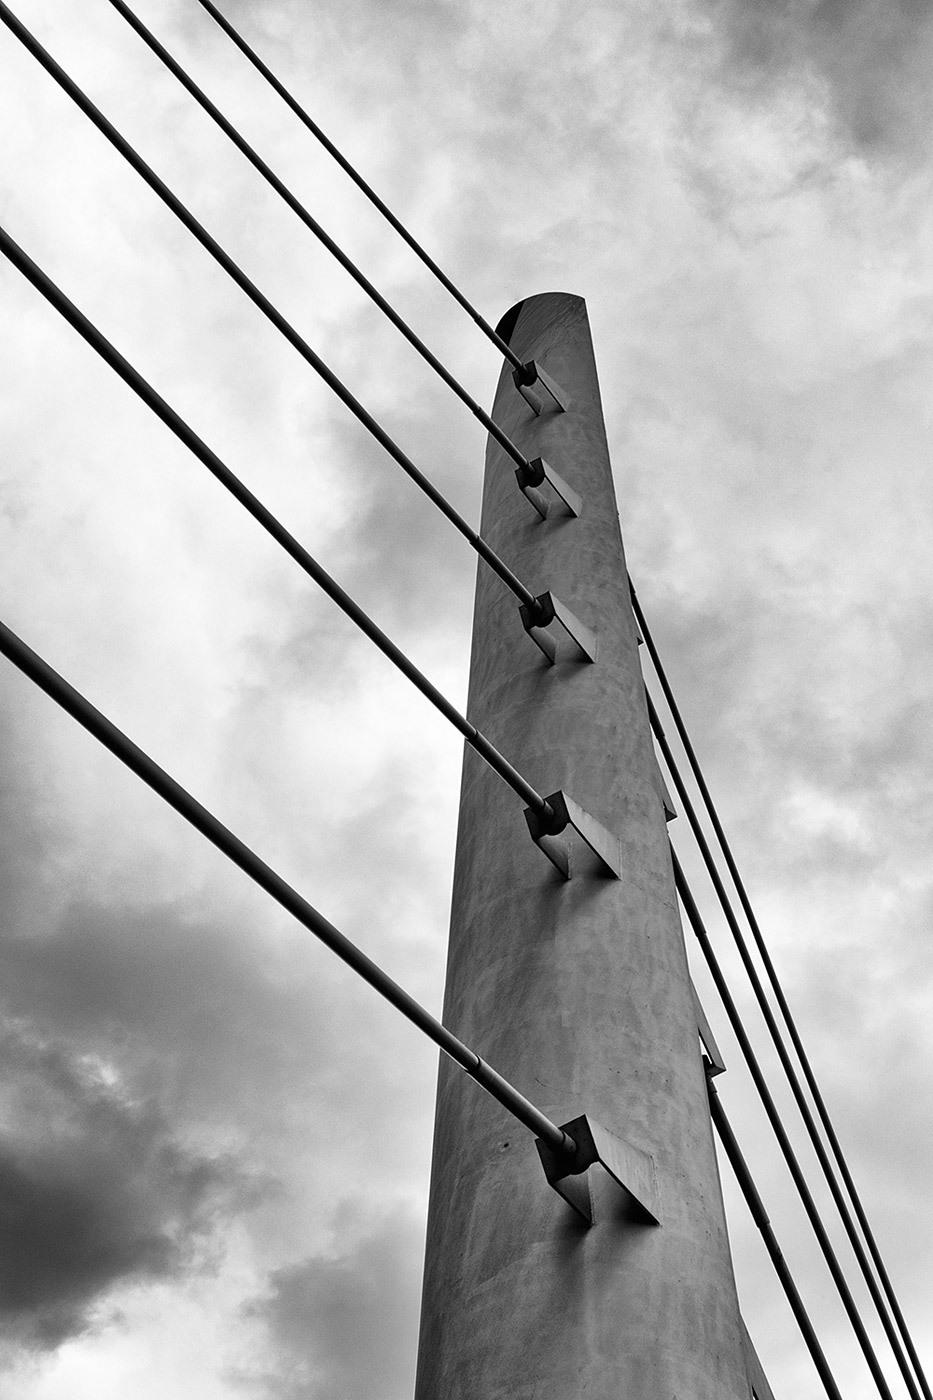 South Quay Footbridge, London. Architect: Wilkinson Eyre. © Edward Neumann / EMCN